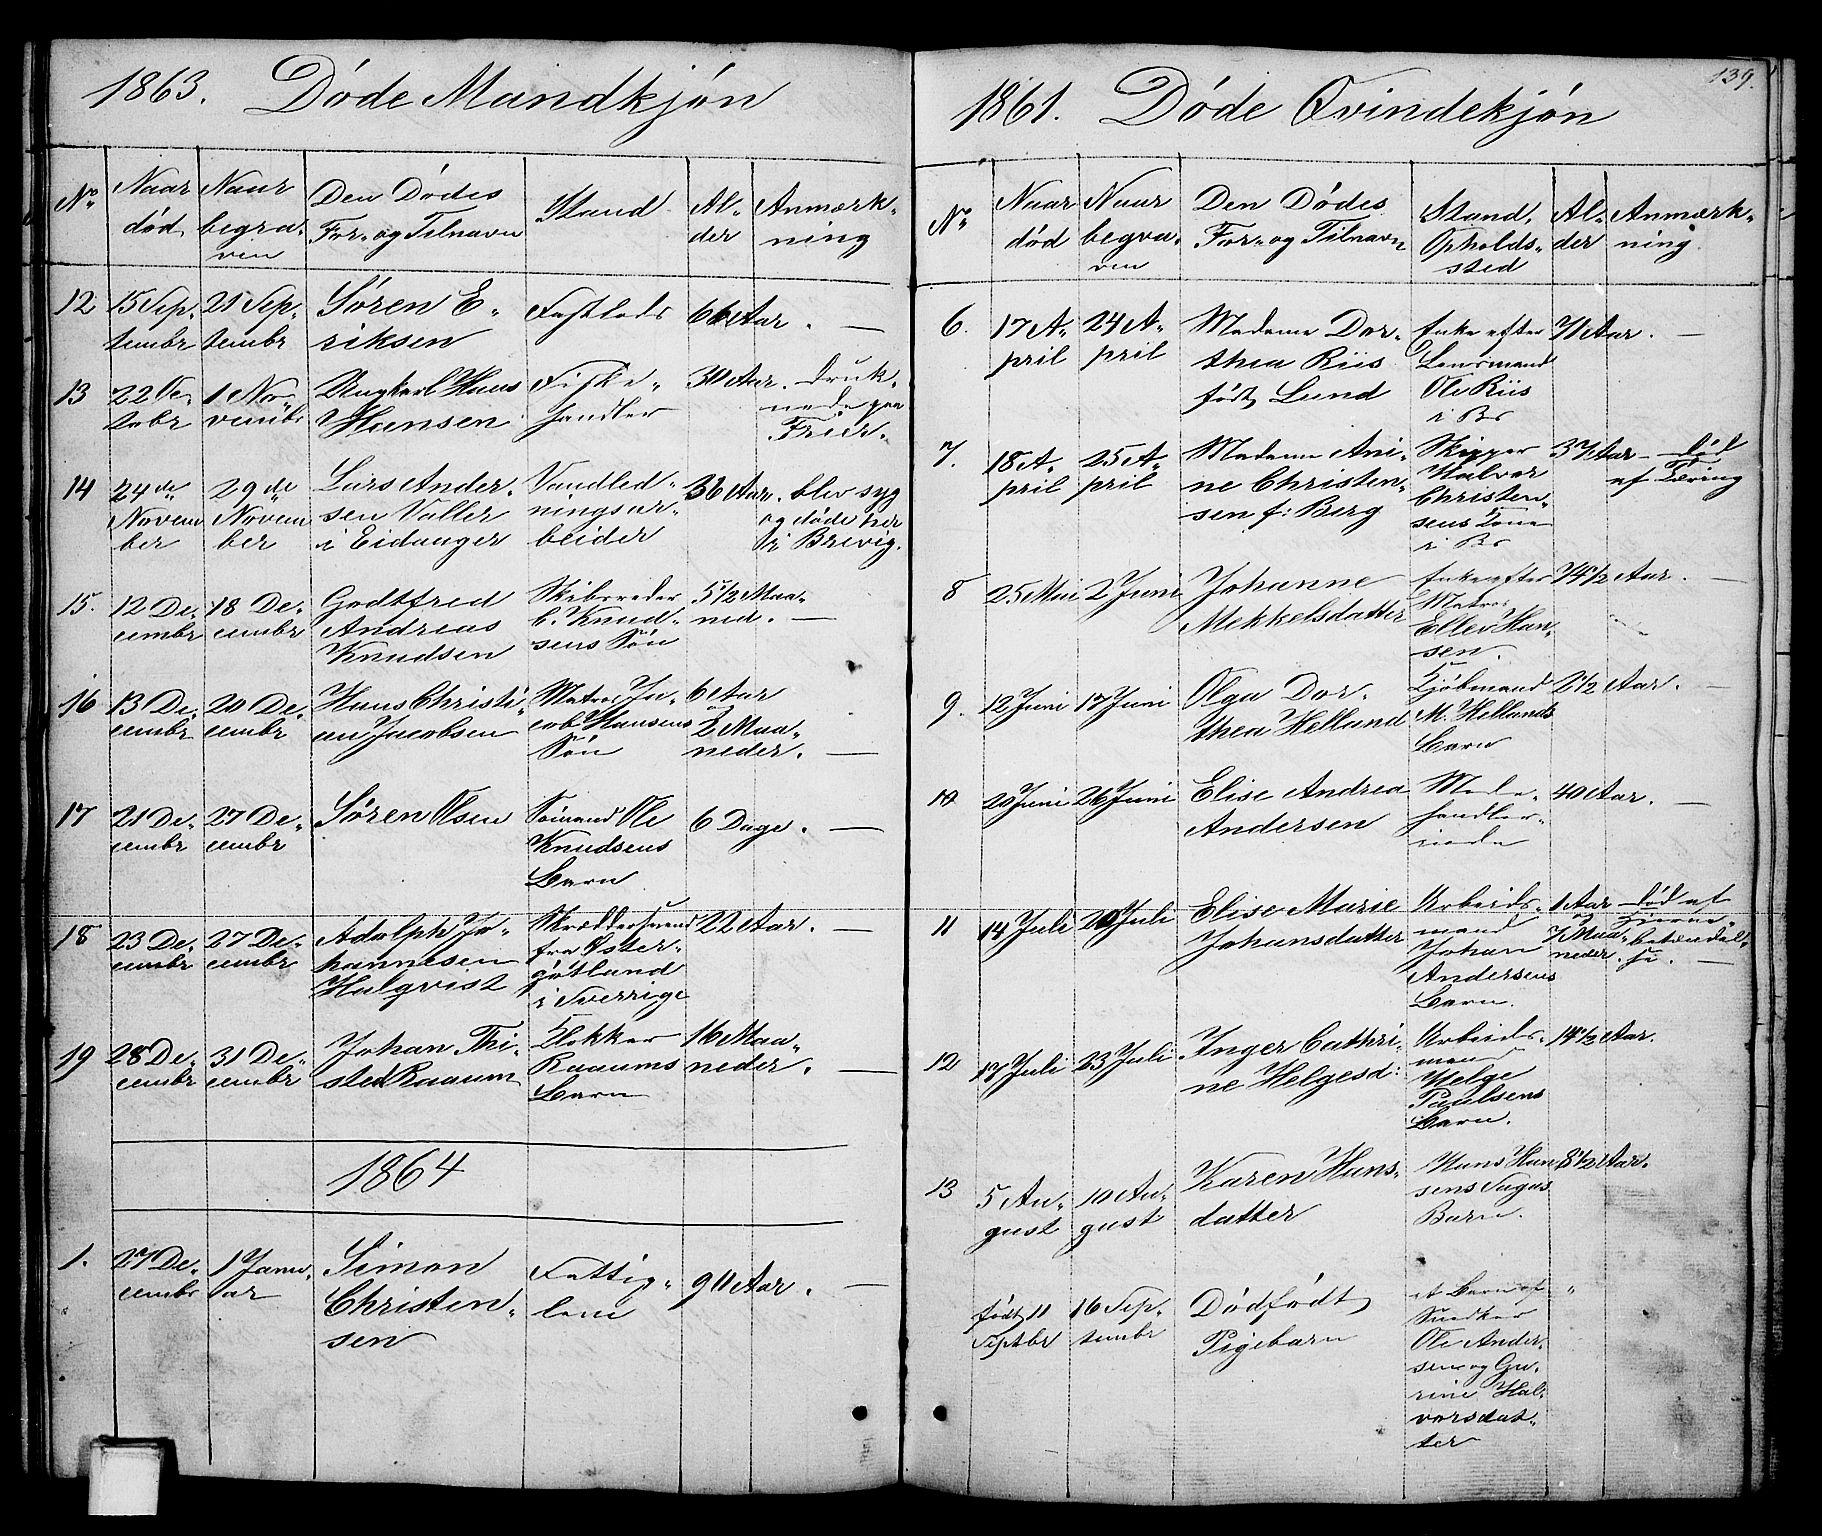 SAKO, Brevik kirkebøker, G/Ga/L0002: Klokkerbok nr. 2, 1846-1865, s. 139